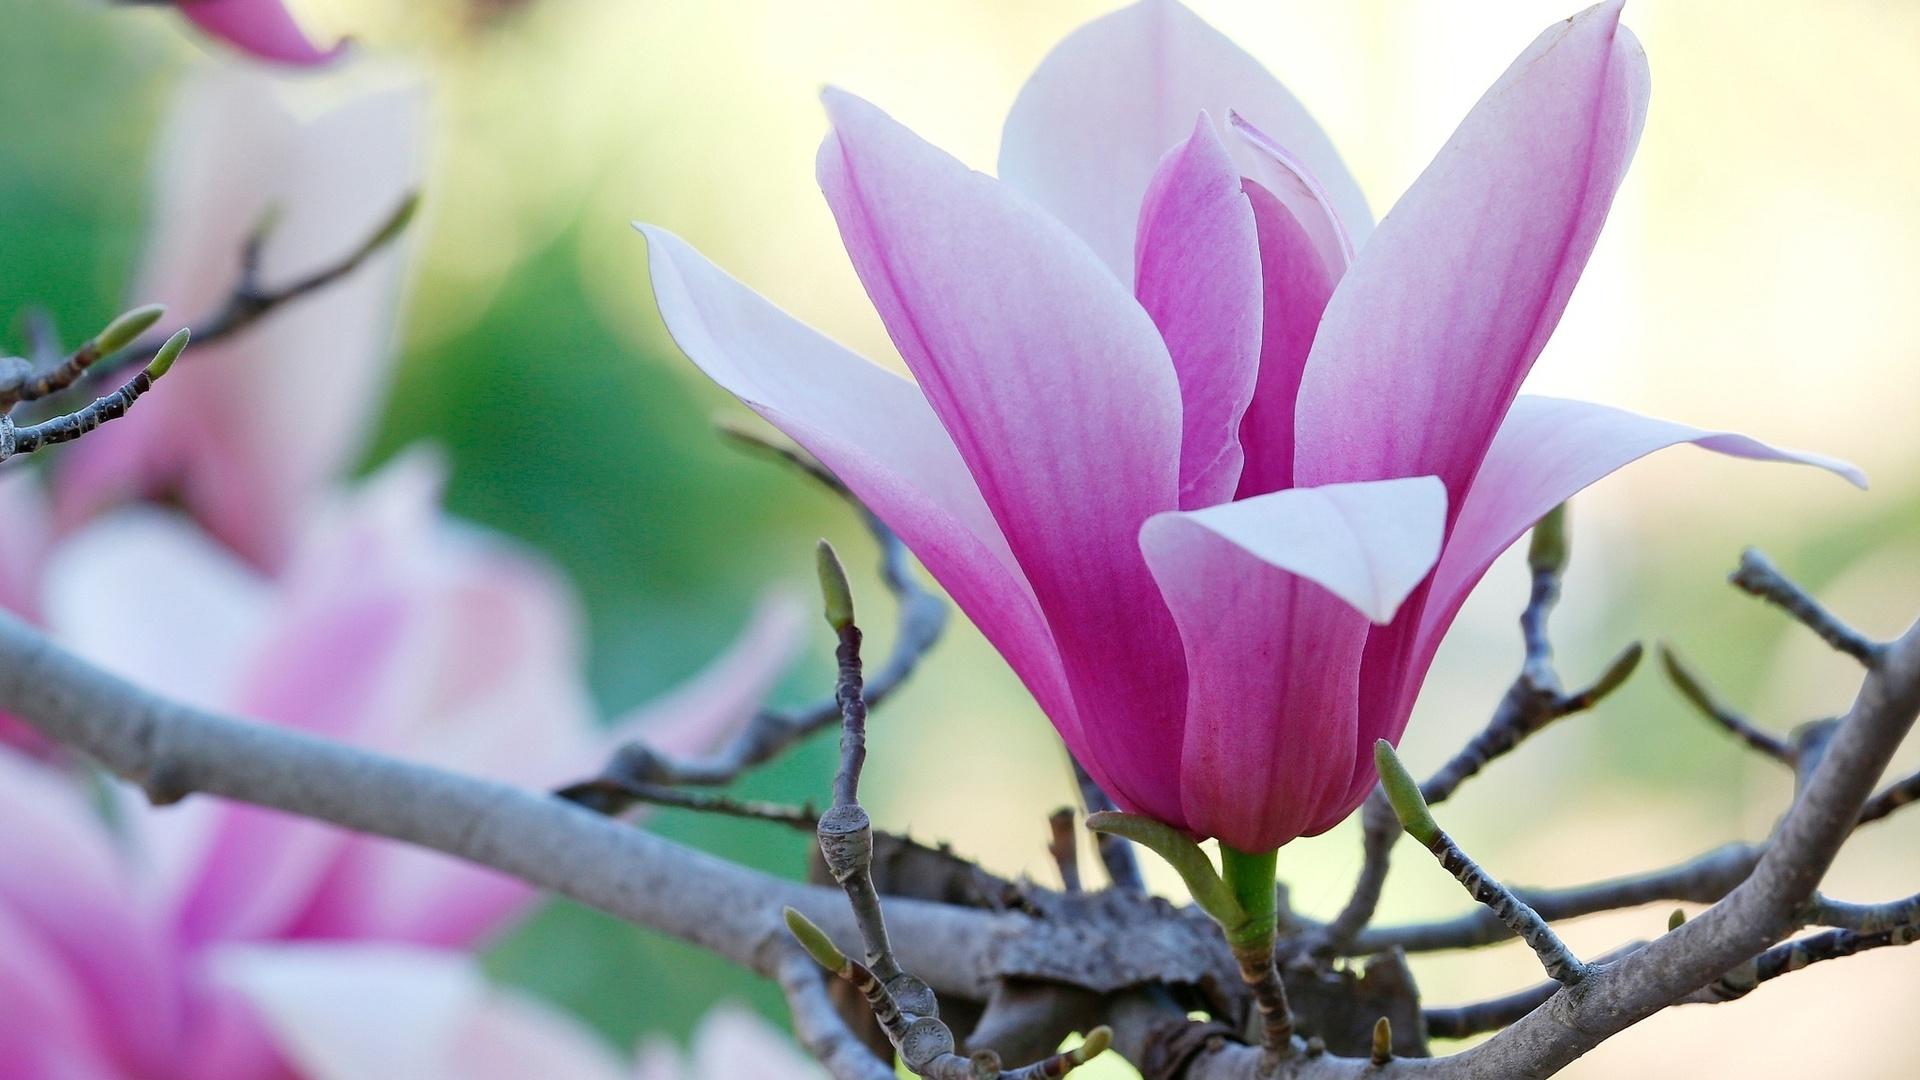 природа, макро фото, дерево, ветки, магнолия, цветок, весна, красиво